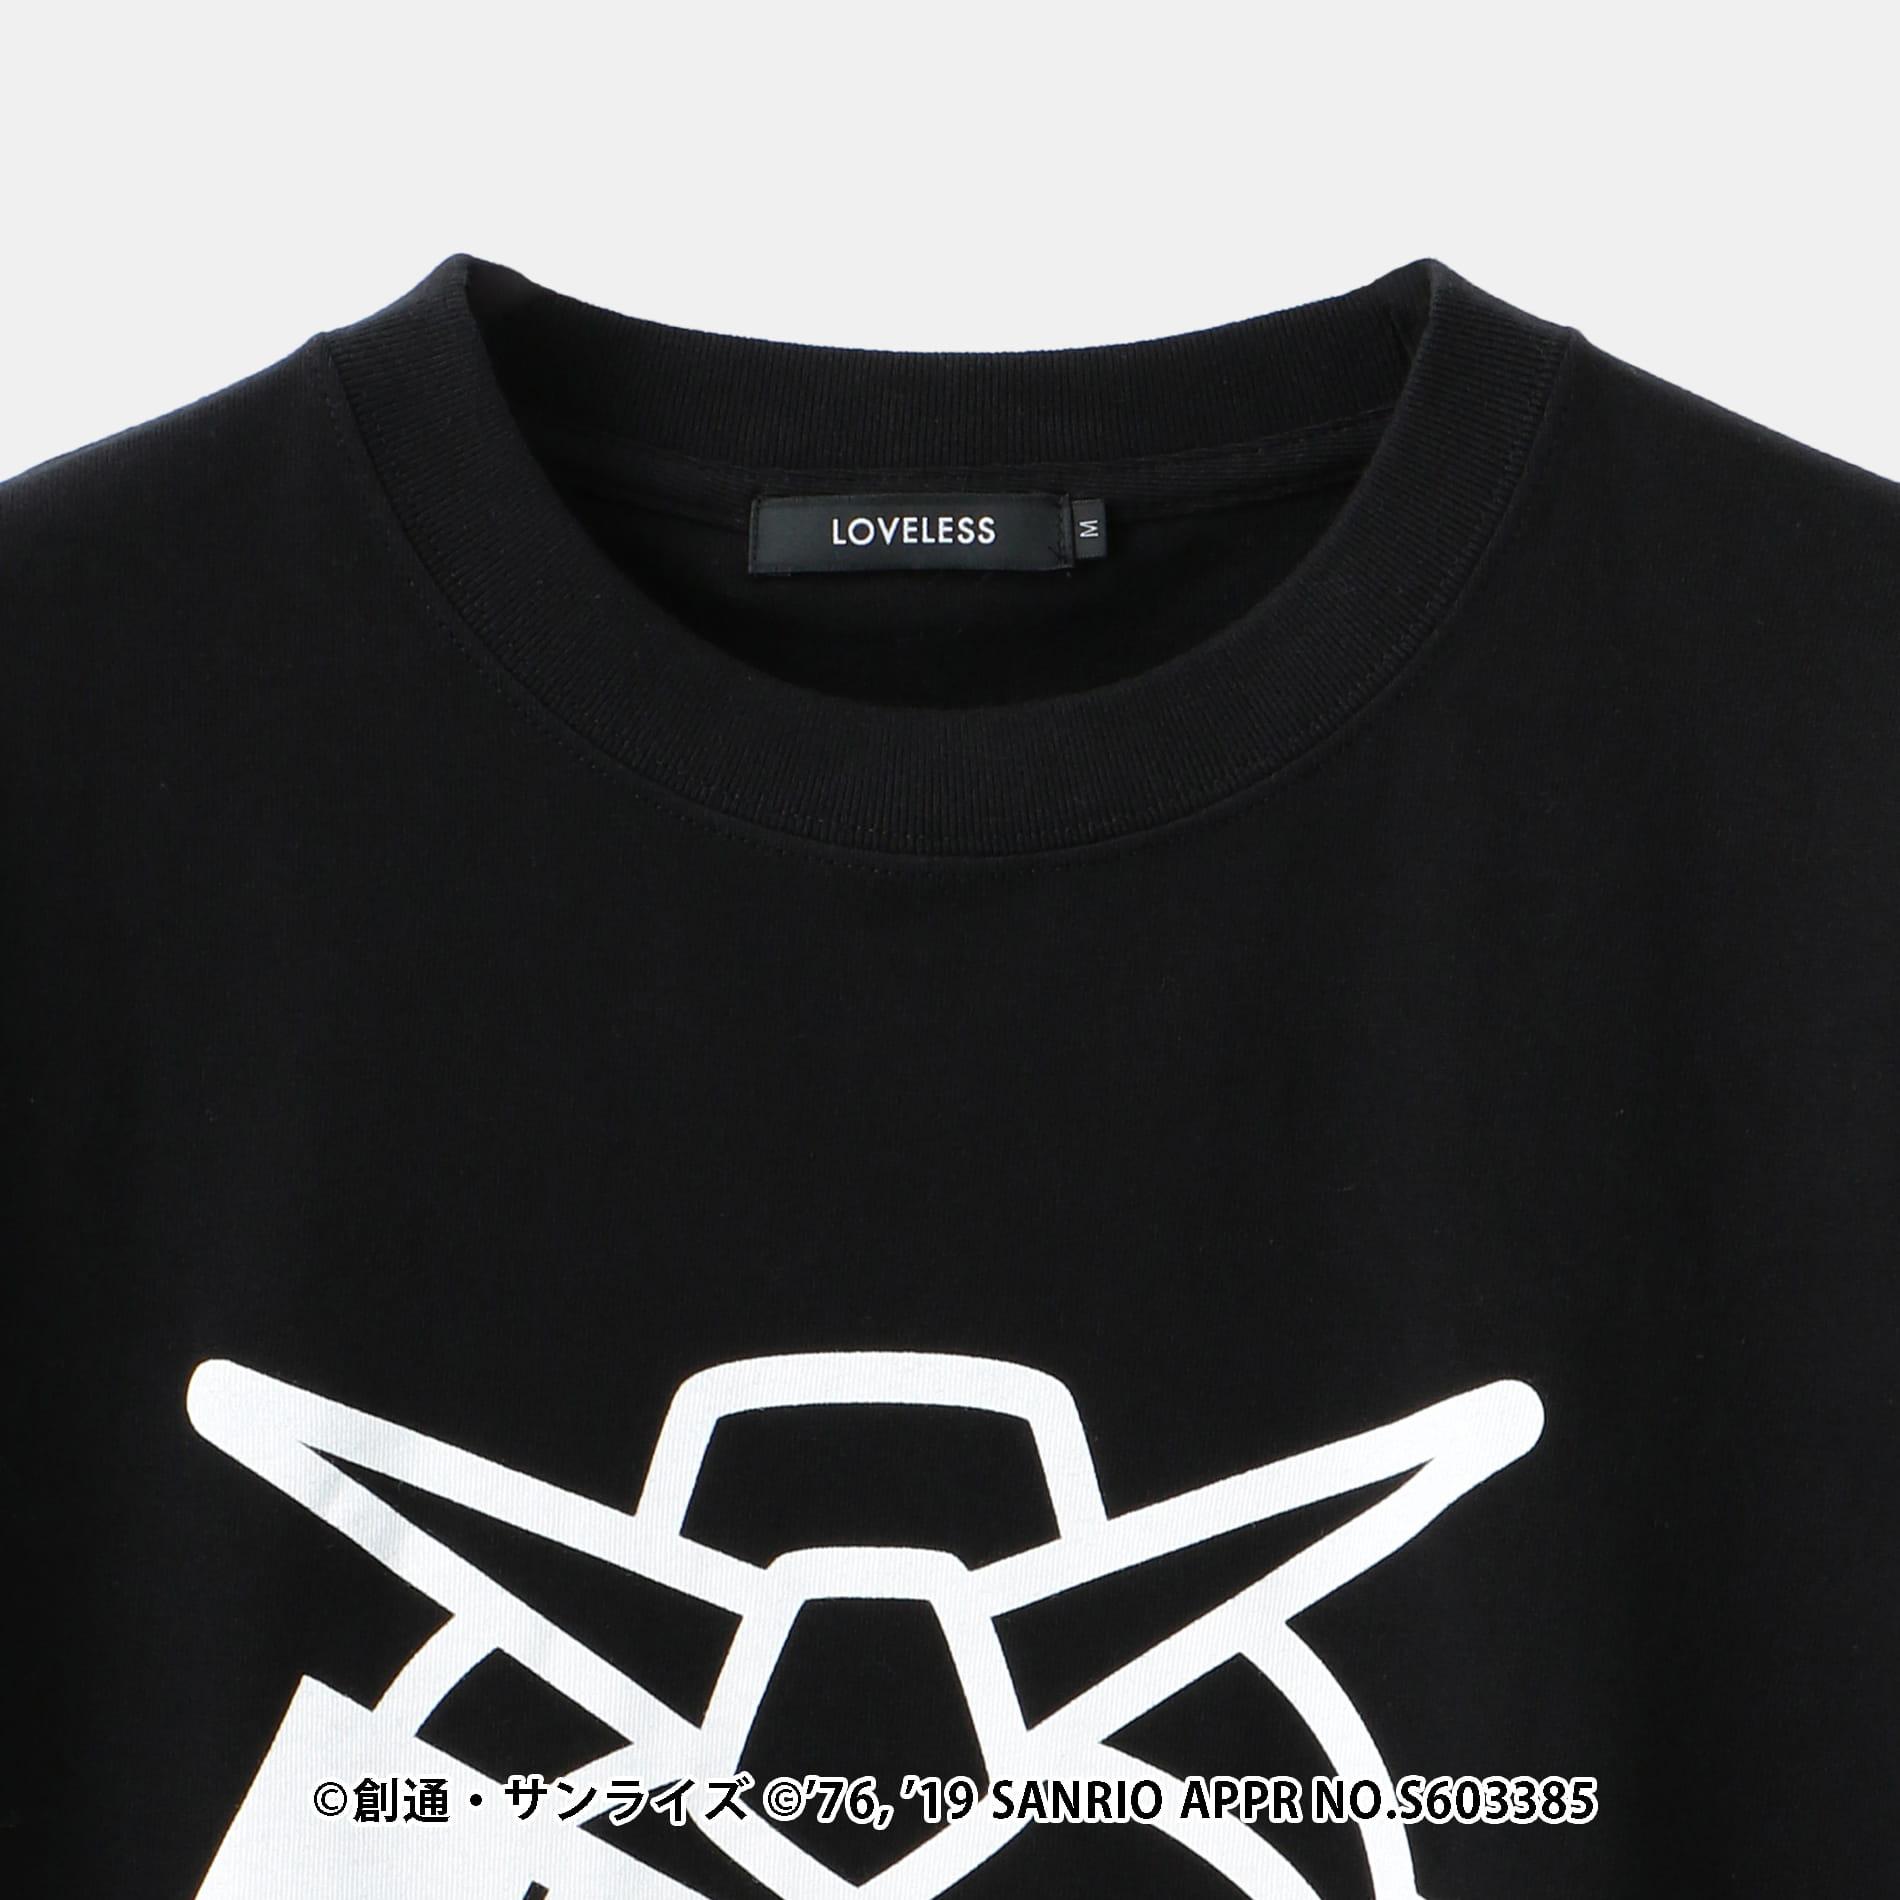 【LOVELESS×機動戦士ガンダム】ガンダムステッカーロゴコラボTシャツ